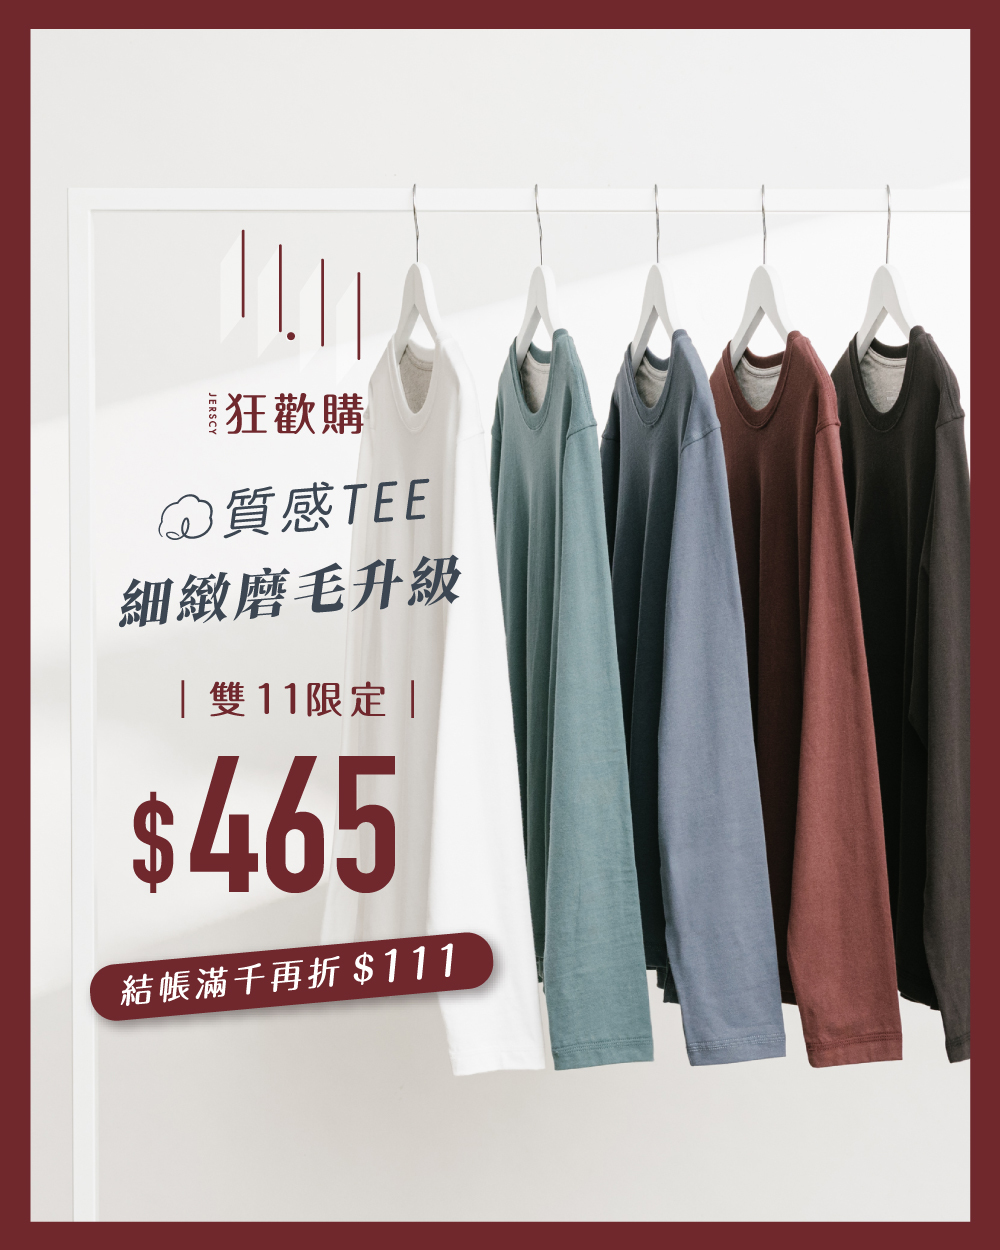 jerscy,最新商品,質感T,111購物節